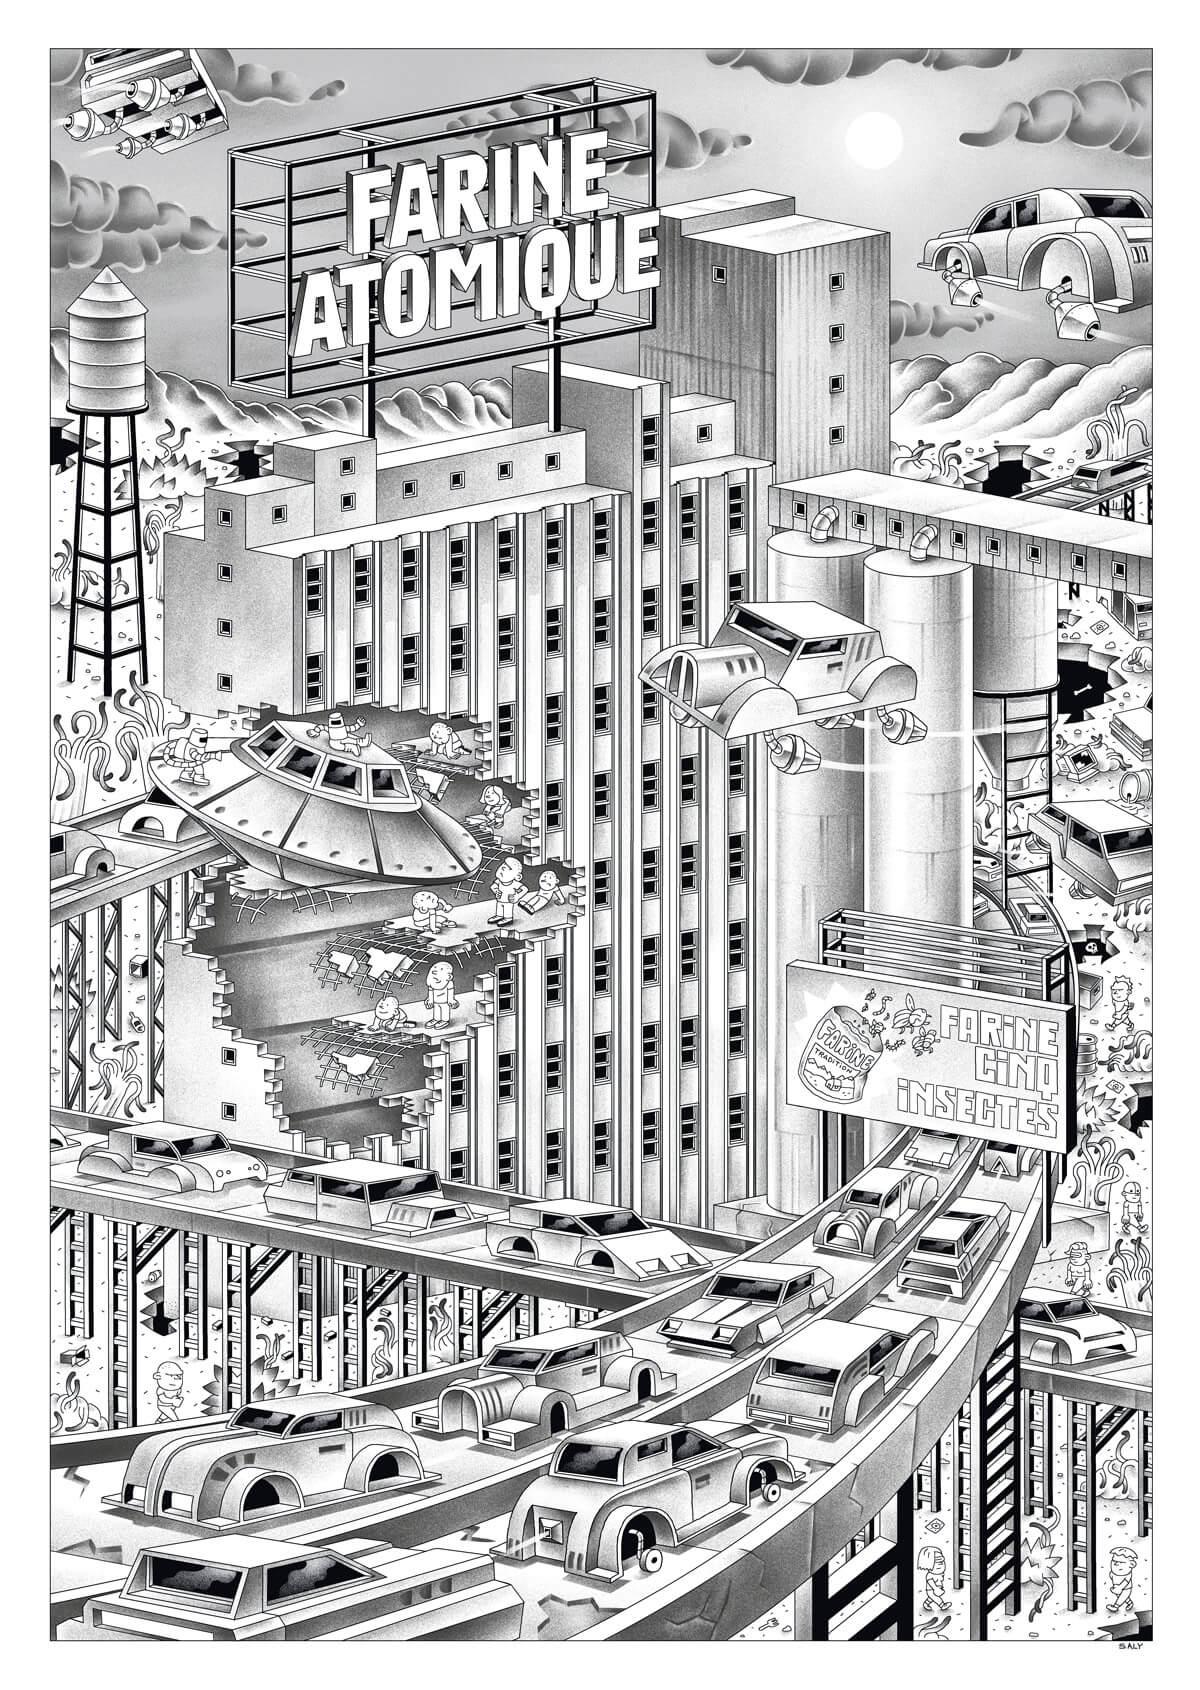 aureliensaly-aurelien-saly-illustration-usine-de-farine